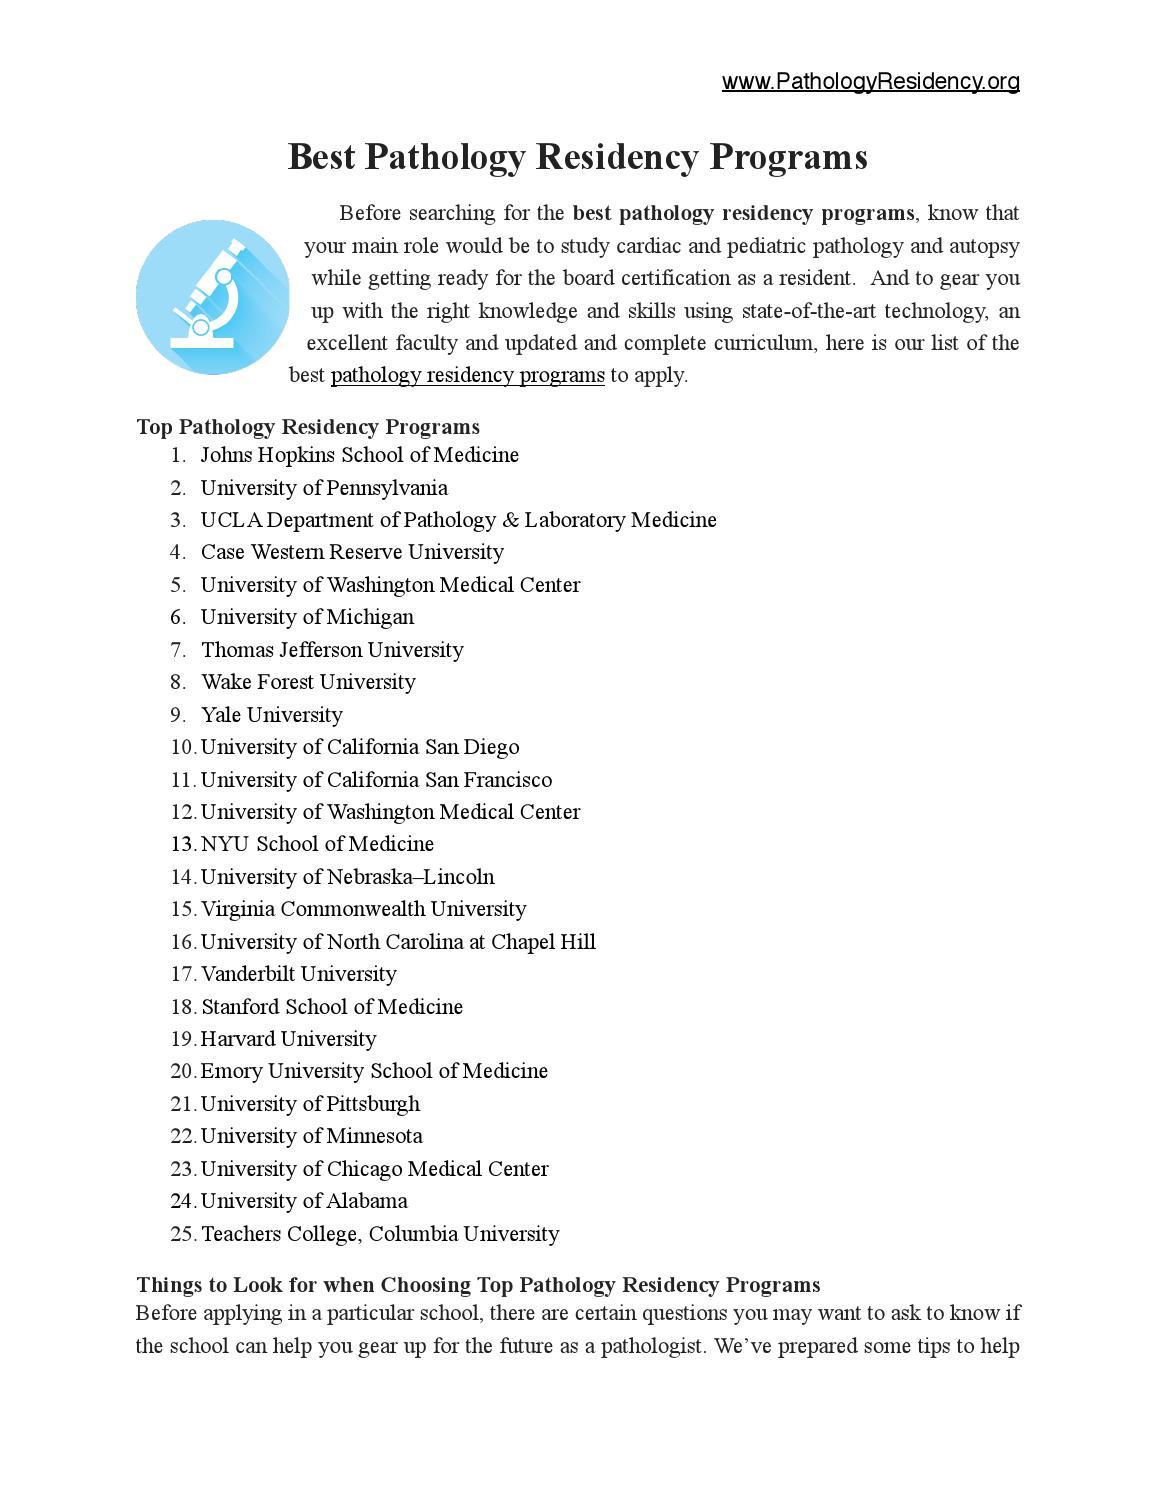 Best Pathology Residency Programs by pathologyresidency - issuu